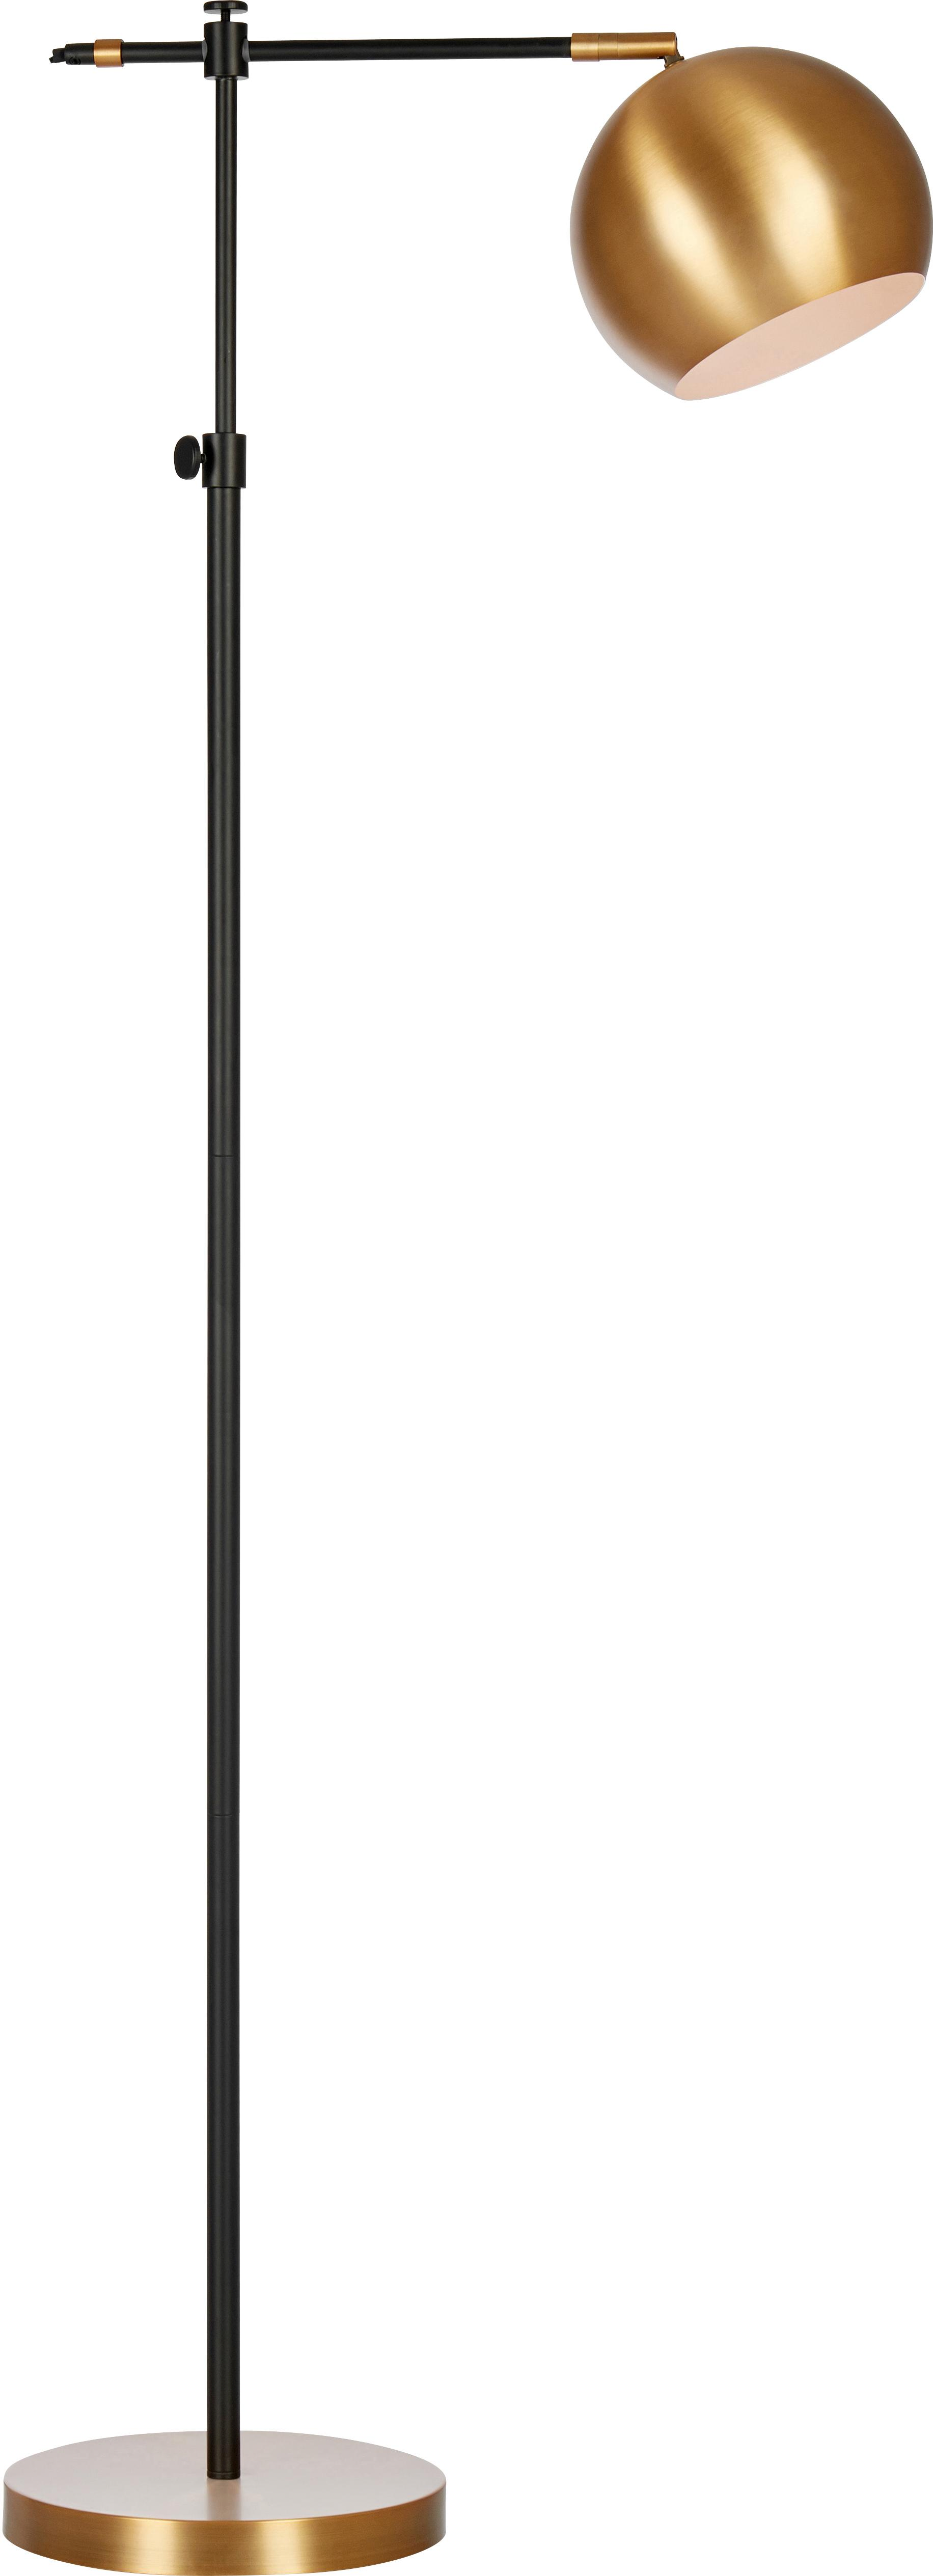 Industrial-Leselampe Chester aus Metall, Gestell: Messing, lackiert, Braun, Schwarz, 25 x 135 cm